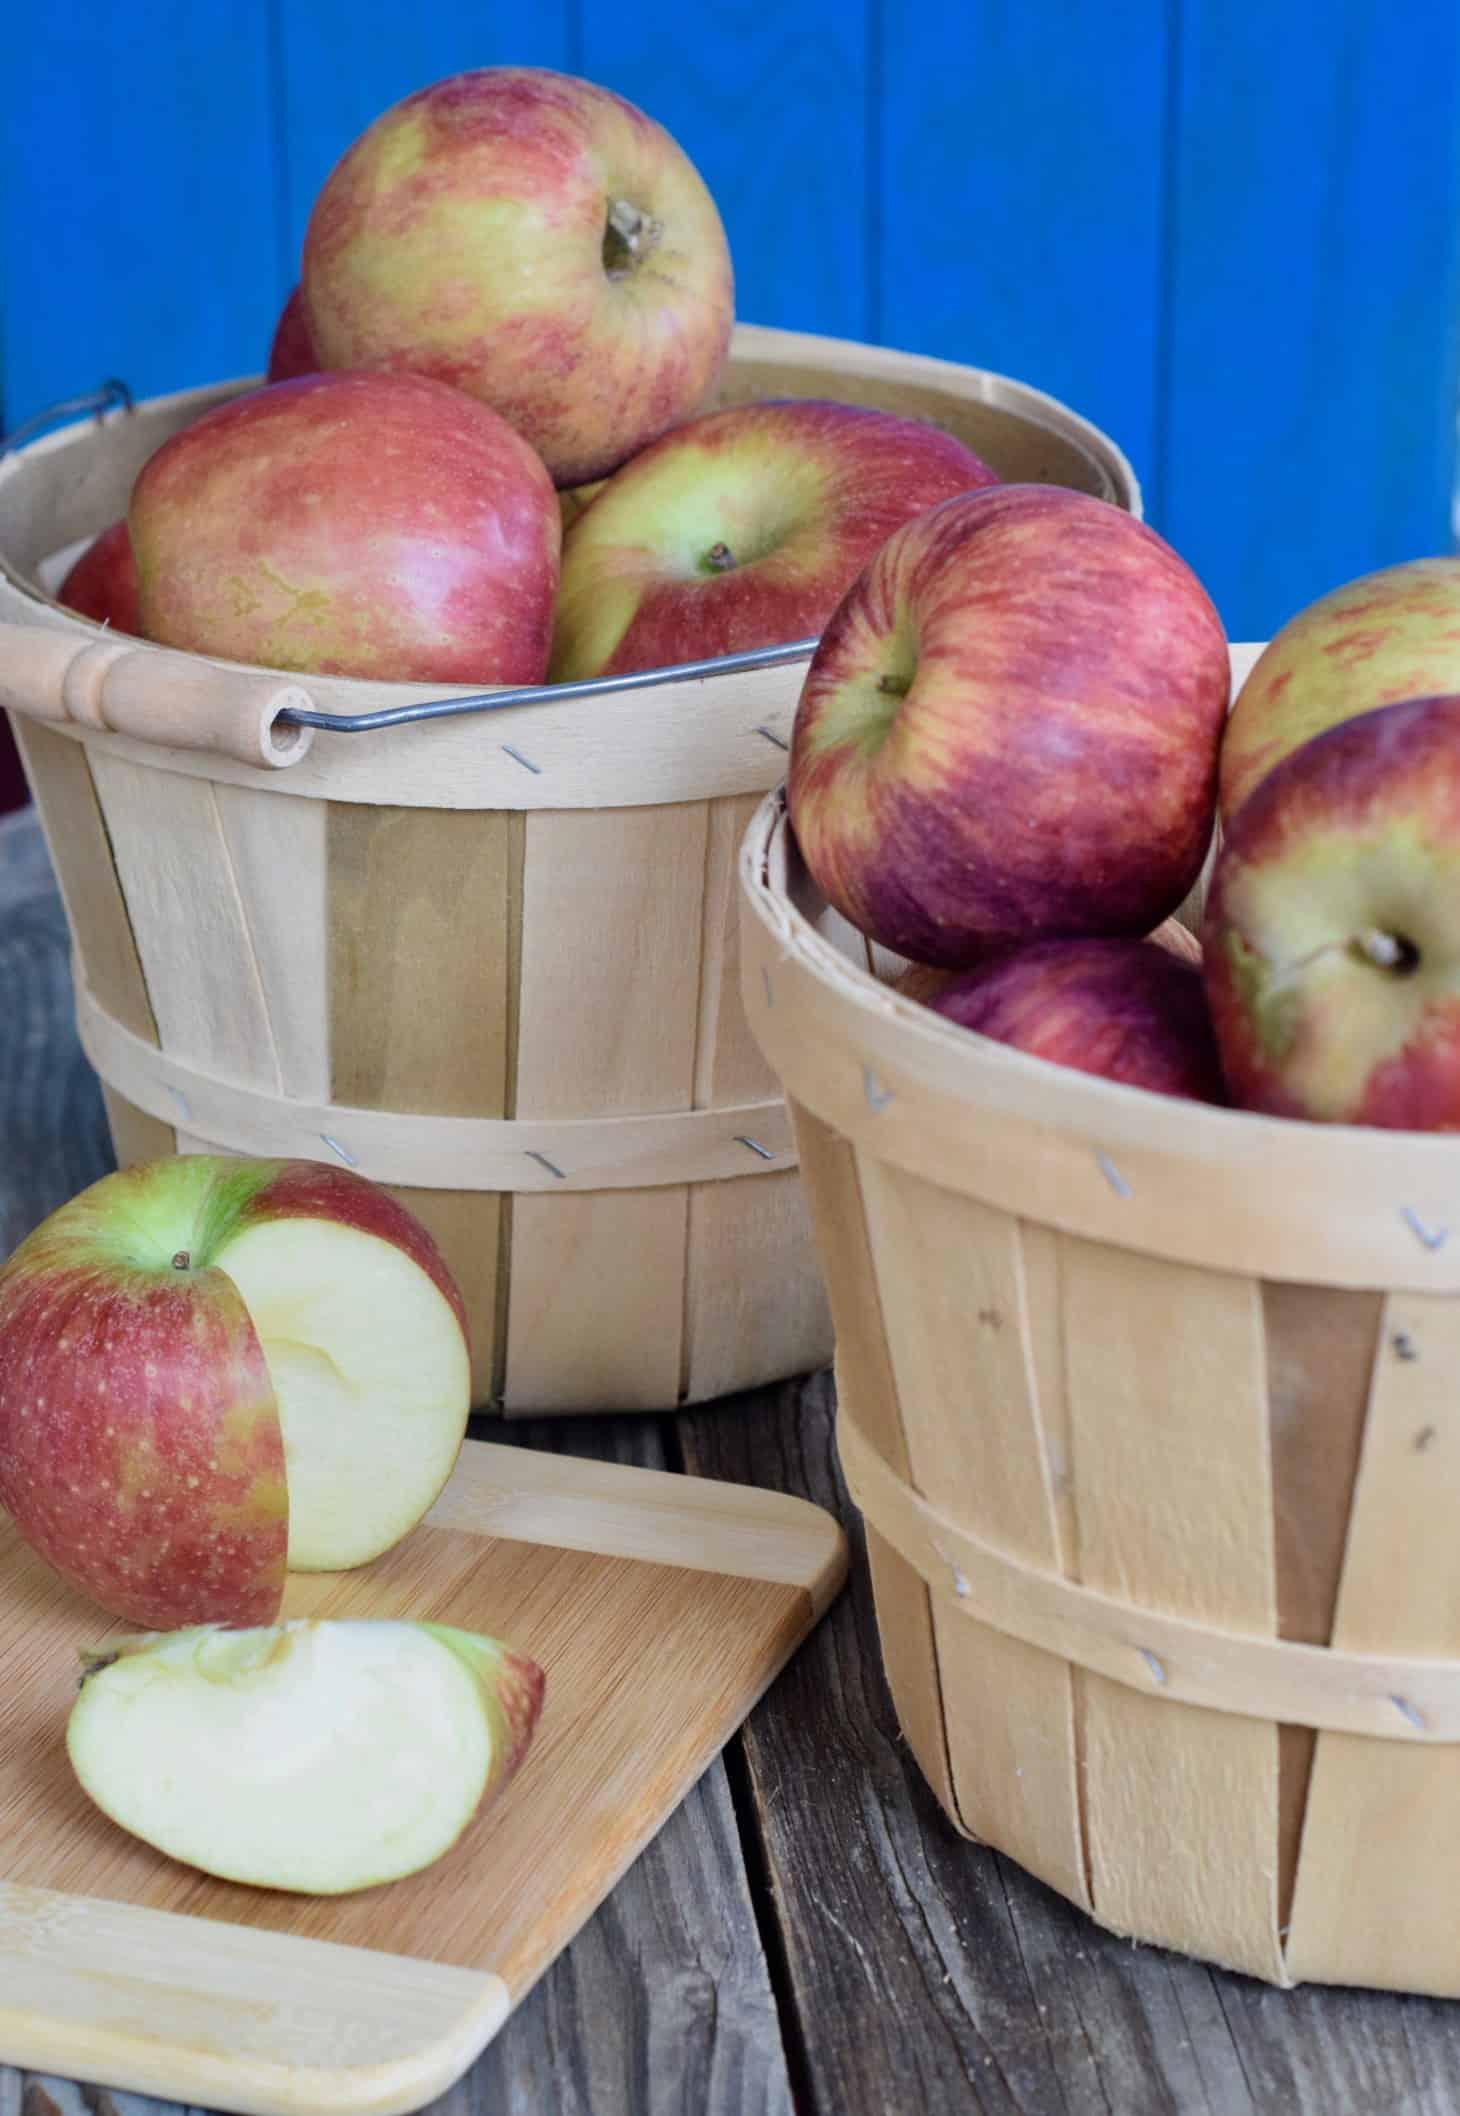 Apples in bushel basket with 1 sliced open